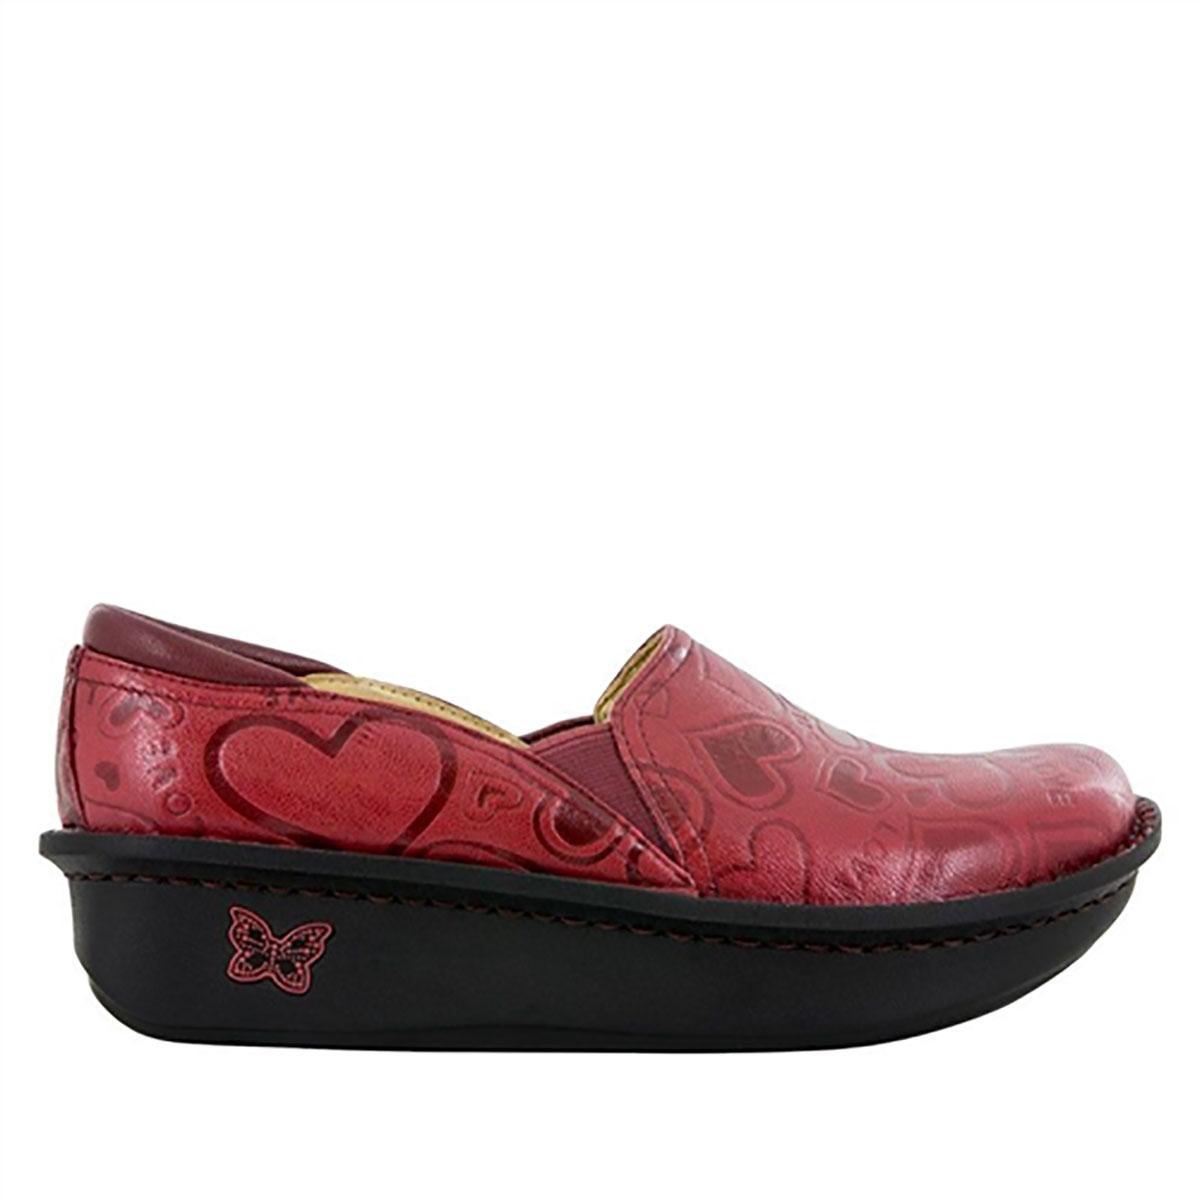 Nurse Alegria Debra I Heart U Red Nursing Shoes